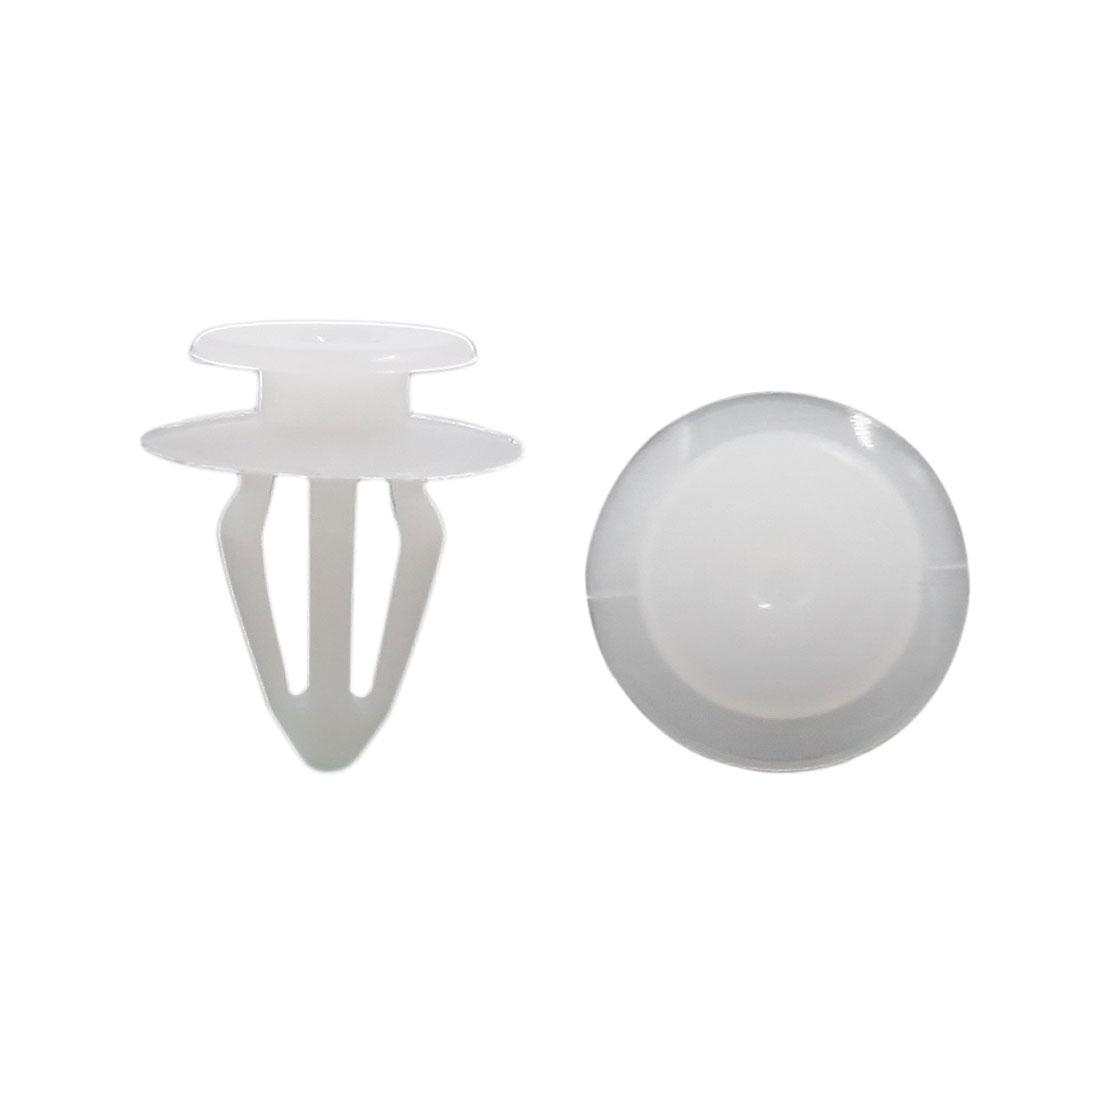 10pcs White Plastic Rivets Fasteners 10mm Dia Hole for Car Auto Bumper Fender